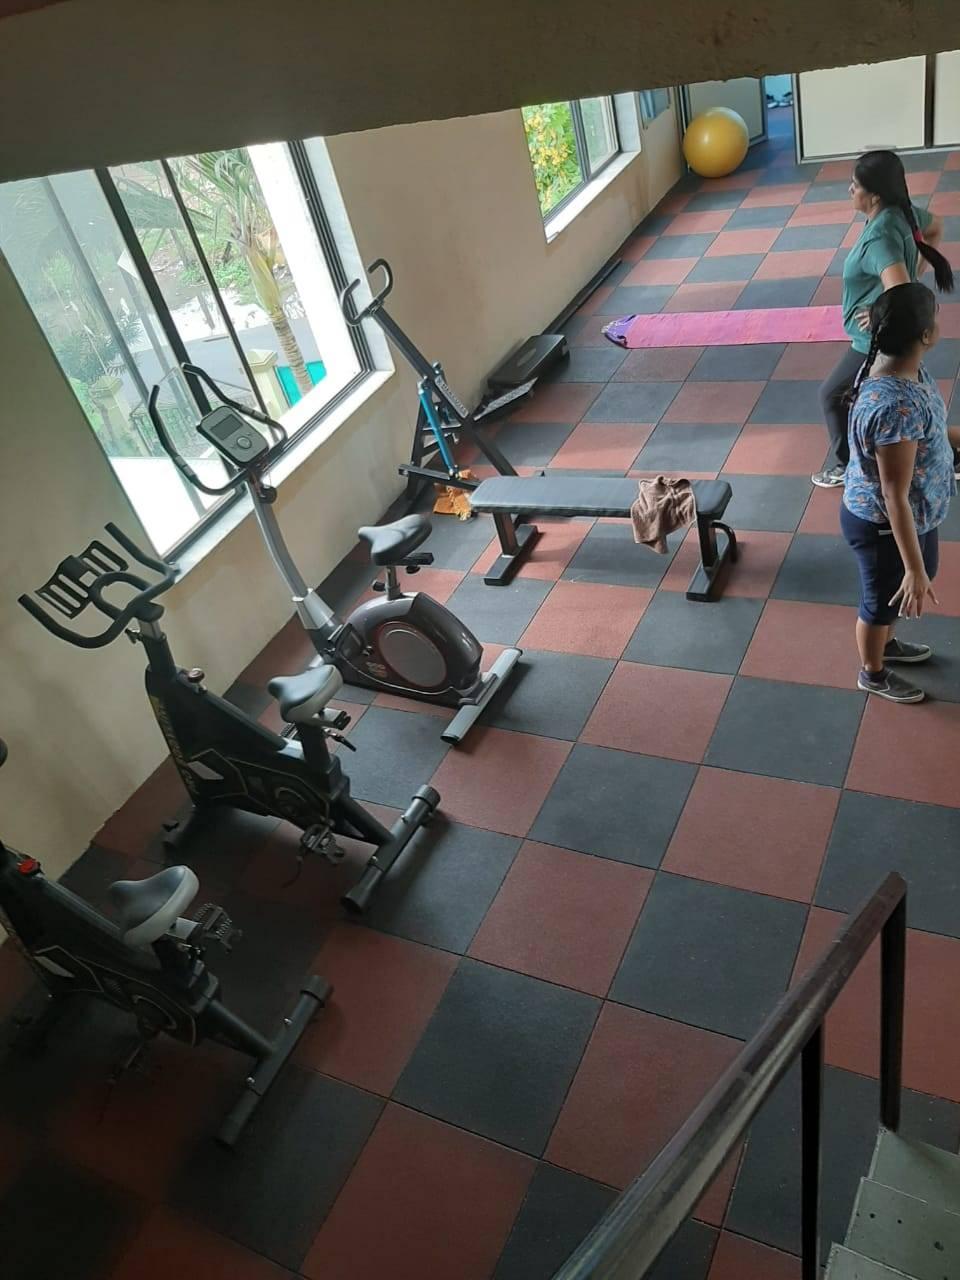 Valsad-Garib-Nawaz-Society-DFC-Decent-Fitness-Centre_384_Mzg0_MTIwOA